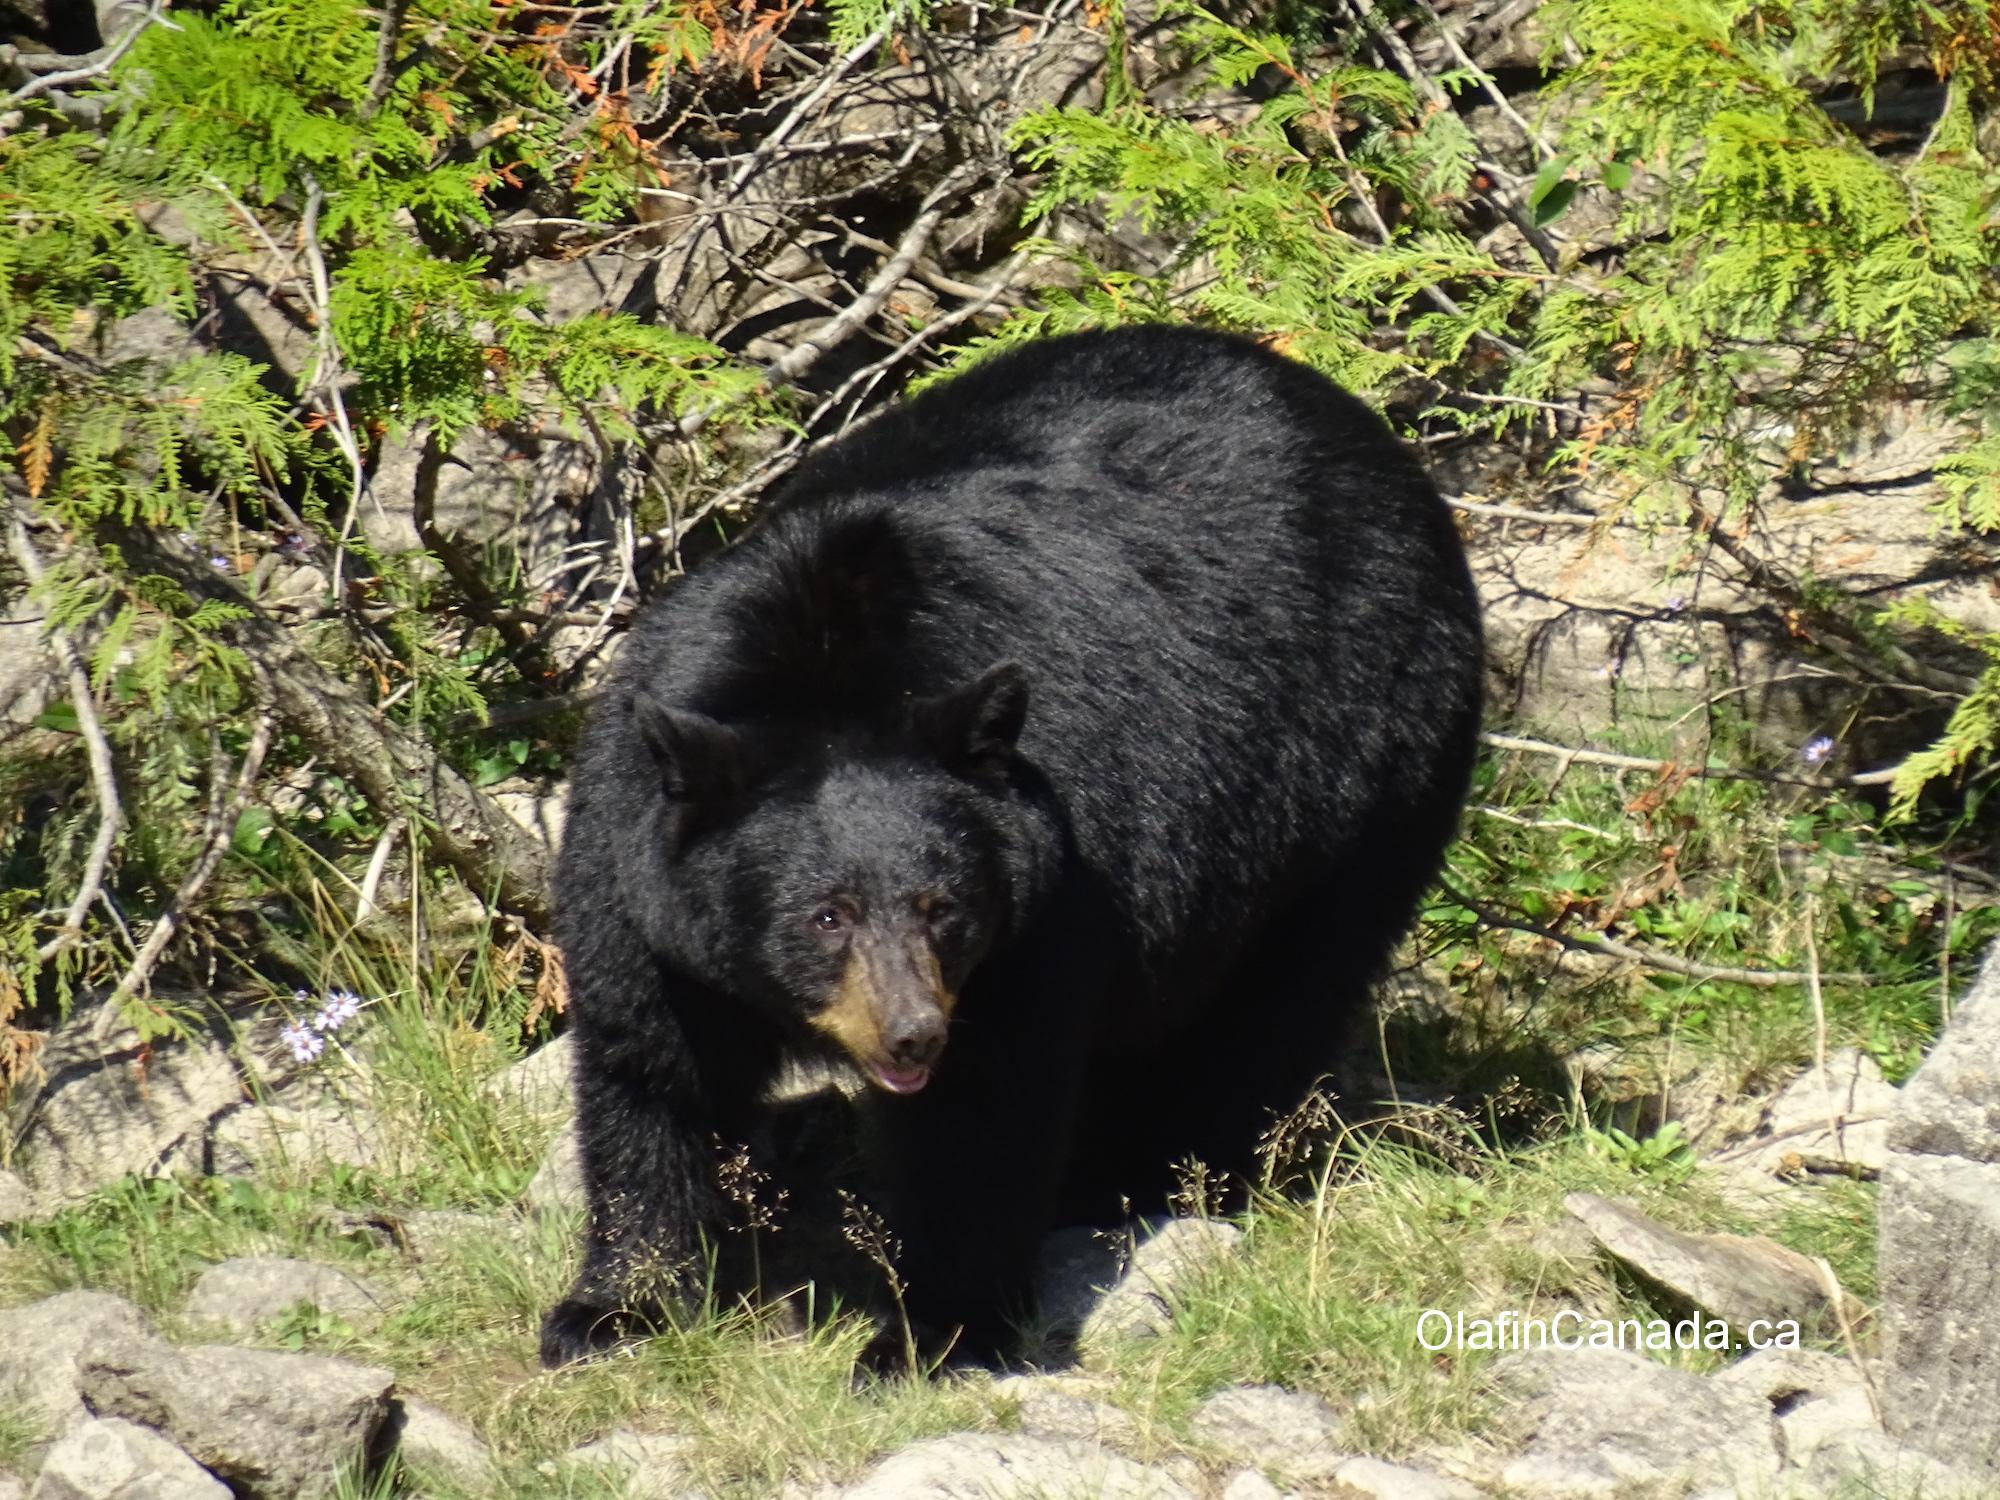 Fat black bear near Blue River #olafincanada #britishcolumbia #discoverbc #wildlife #blueriver #blackbear